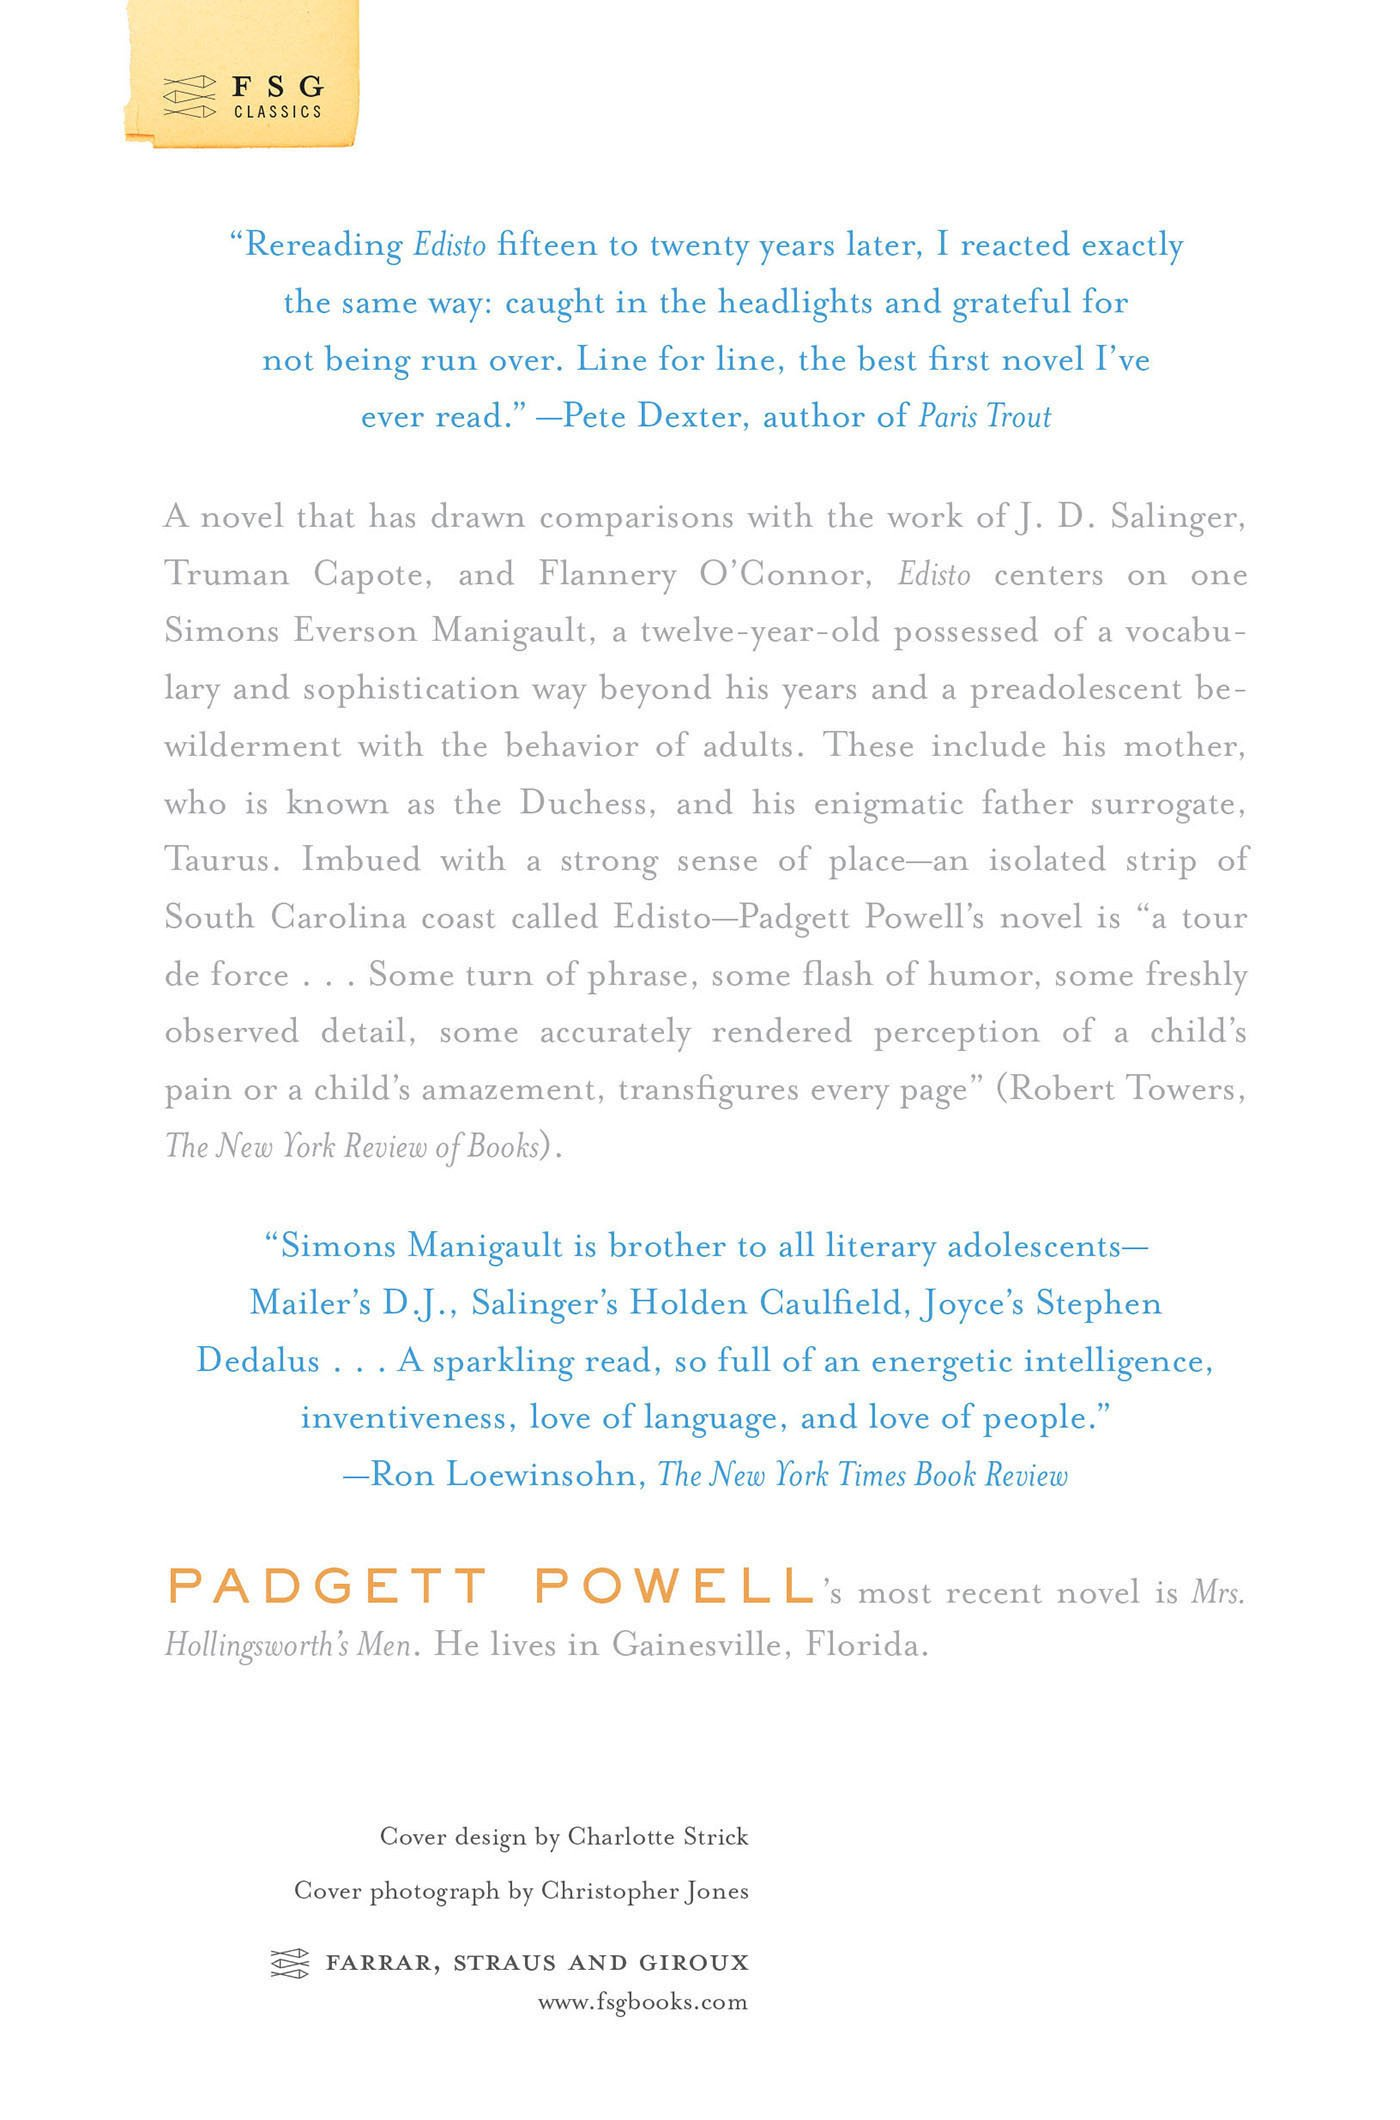 Edisto: A Novel (fsg Classics): Padgett Powell: 9780374531683: Amazon:  Books